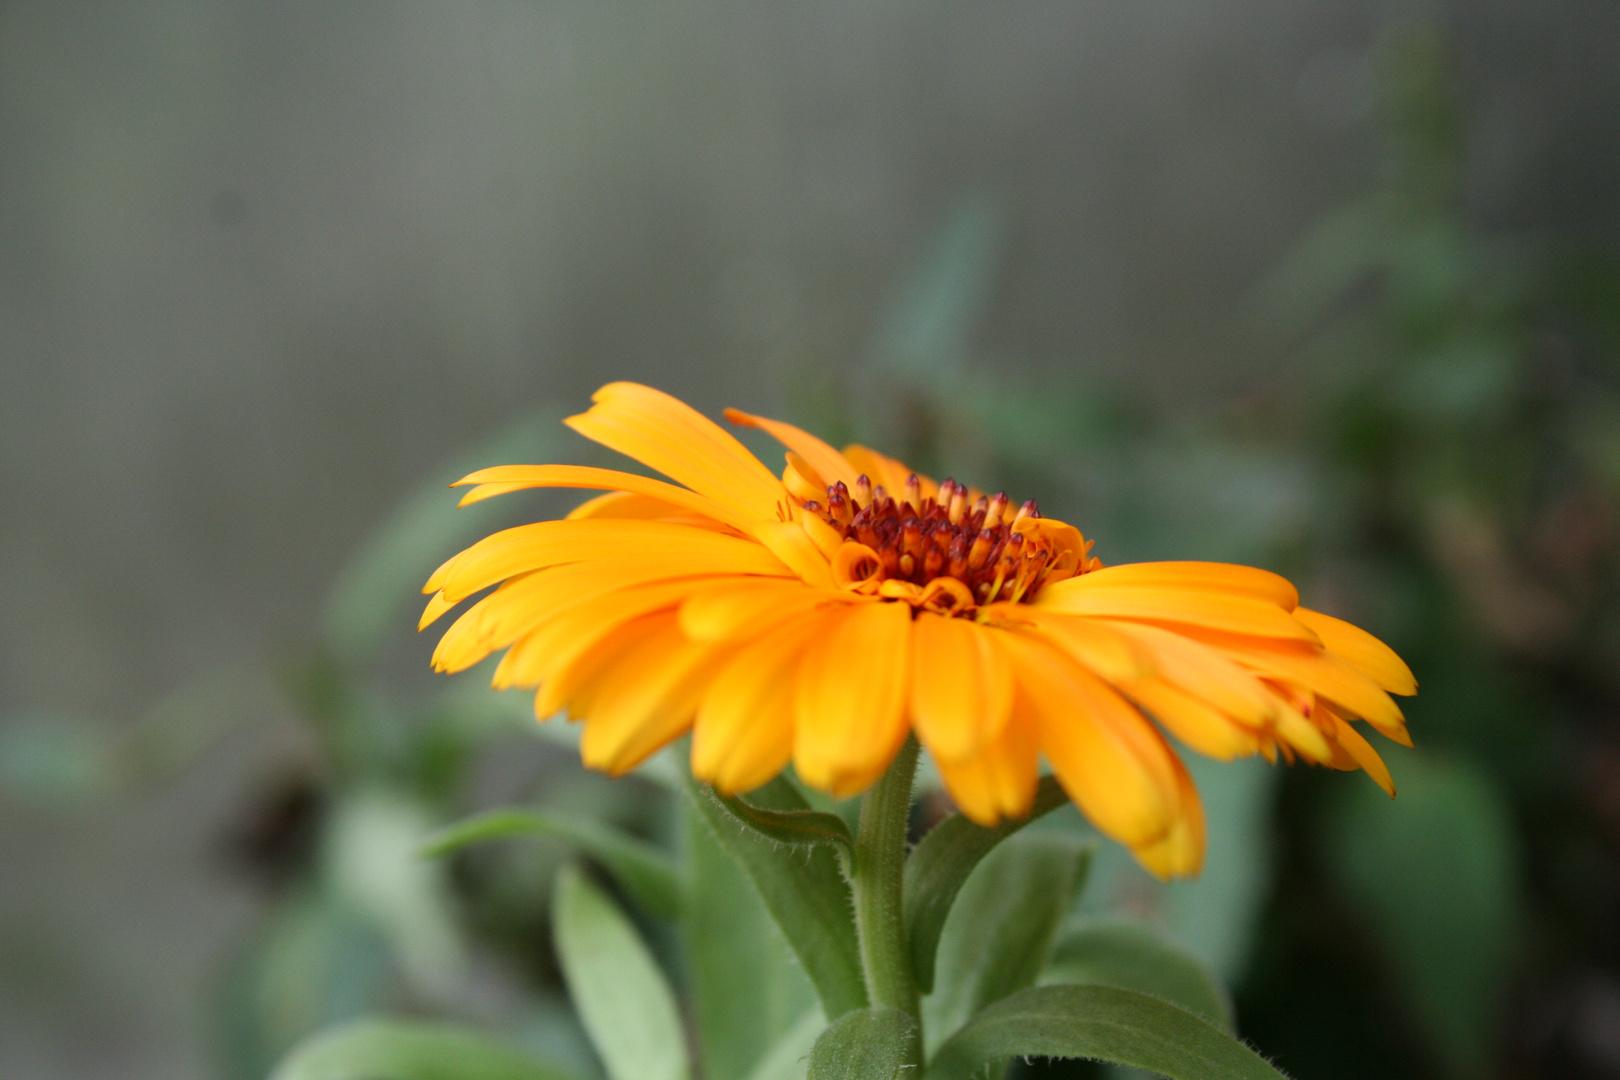 Ringelblümchen